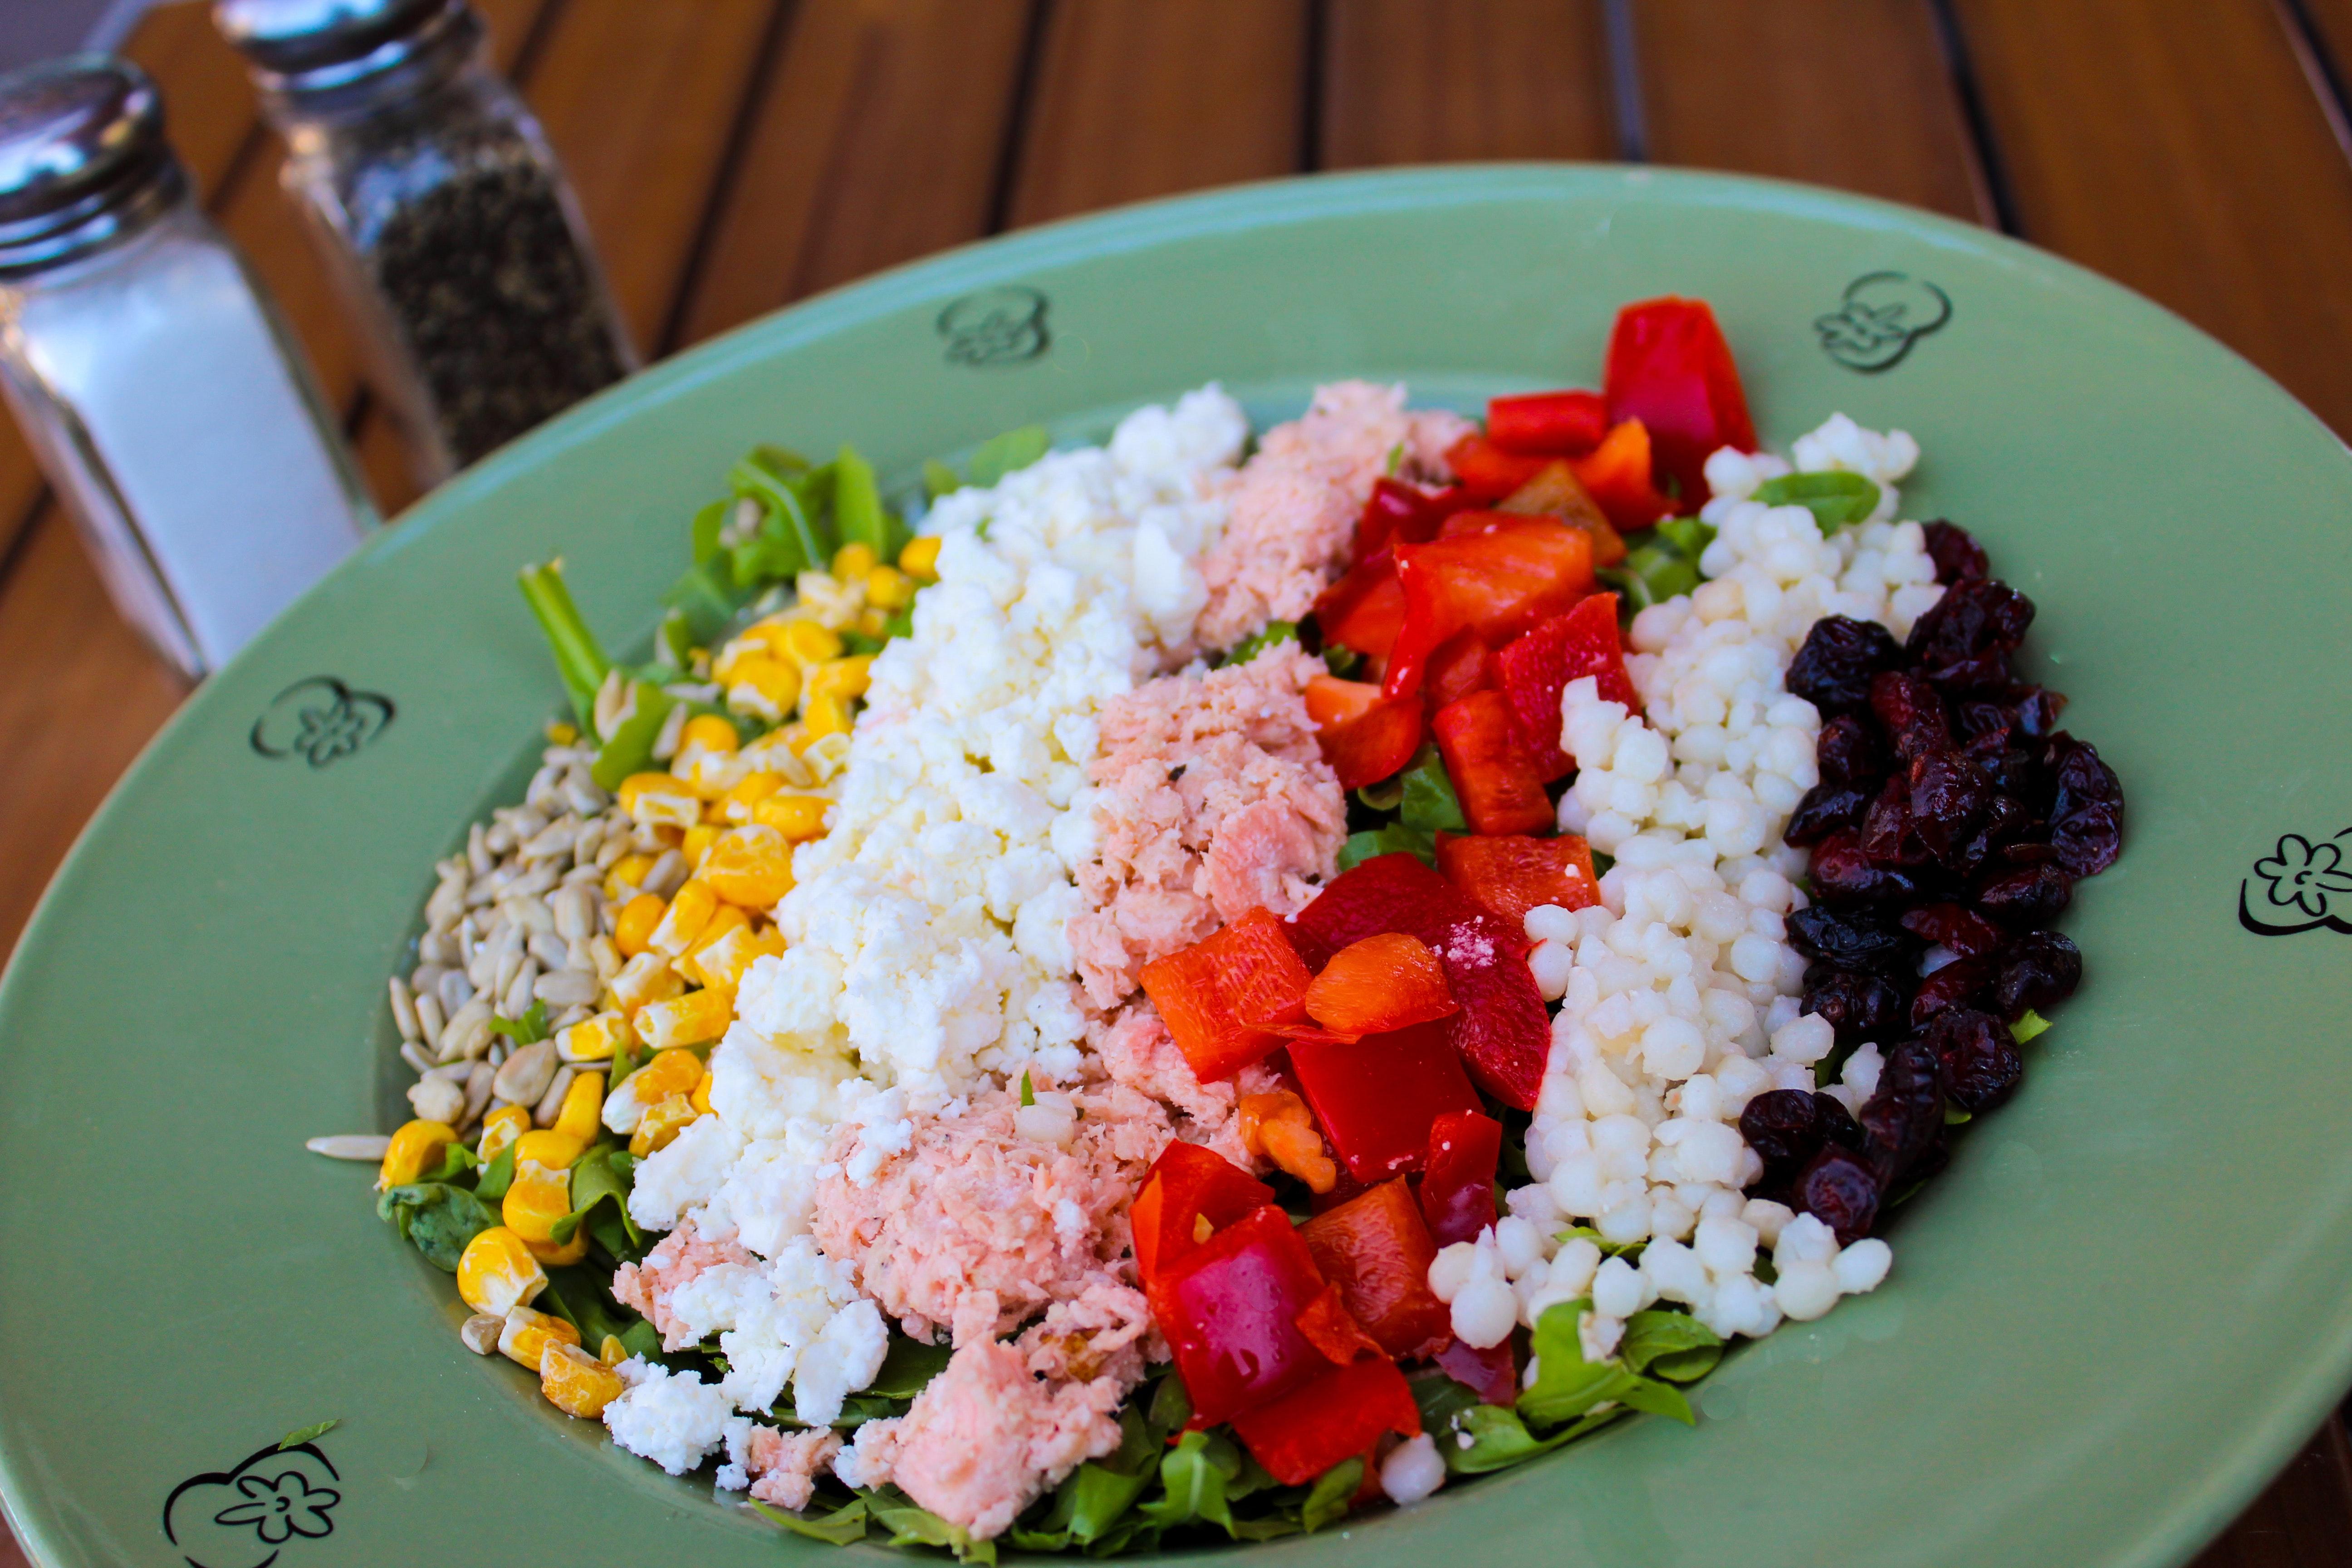 Green Ceramic Plate, Salt, Salad, Red pepper, Sunflower seeds, HQ Photo